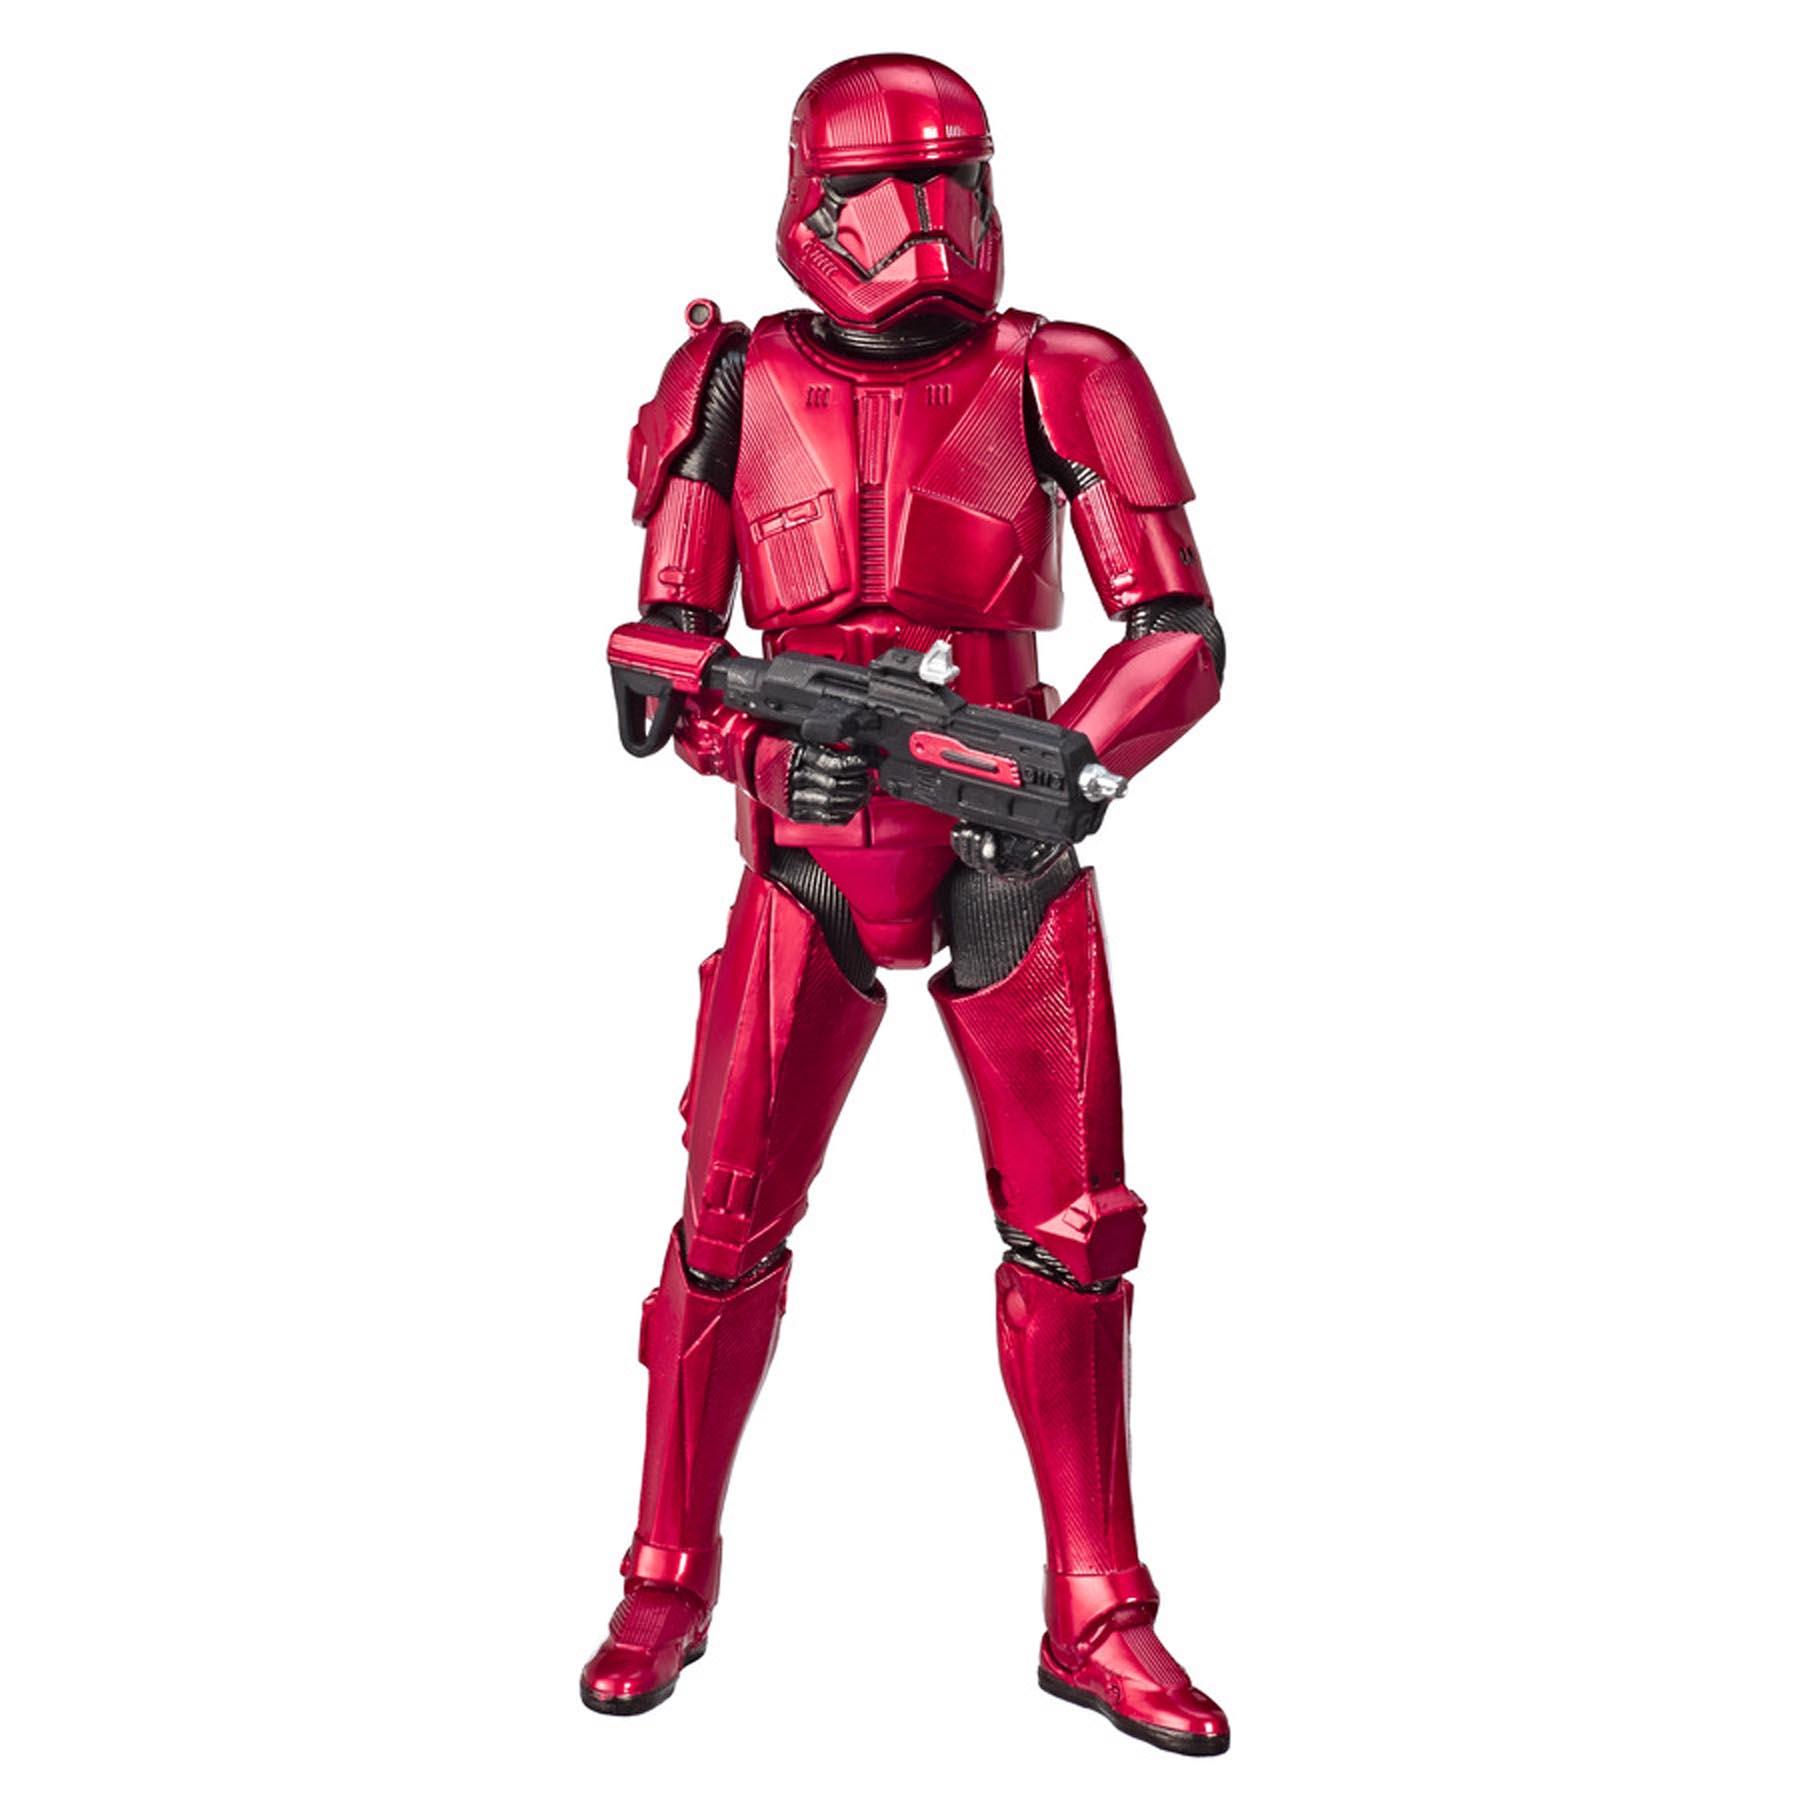 E8439 Carbonized Sith Trooper Black Series